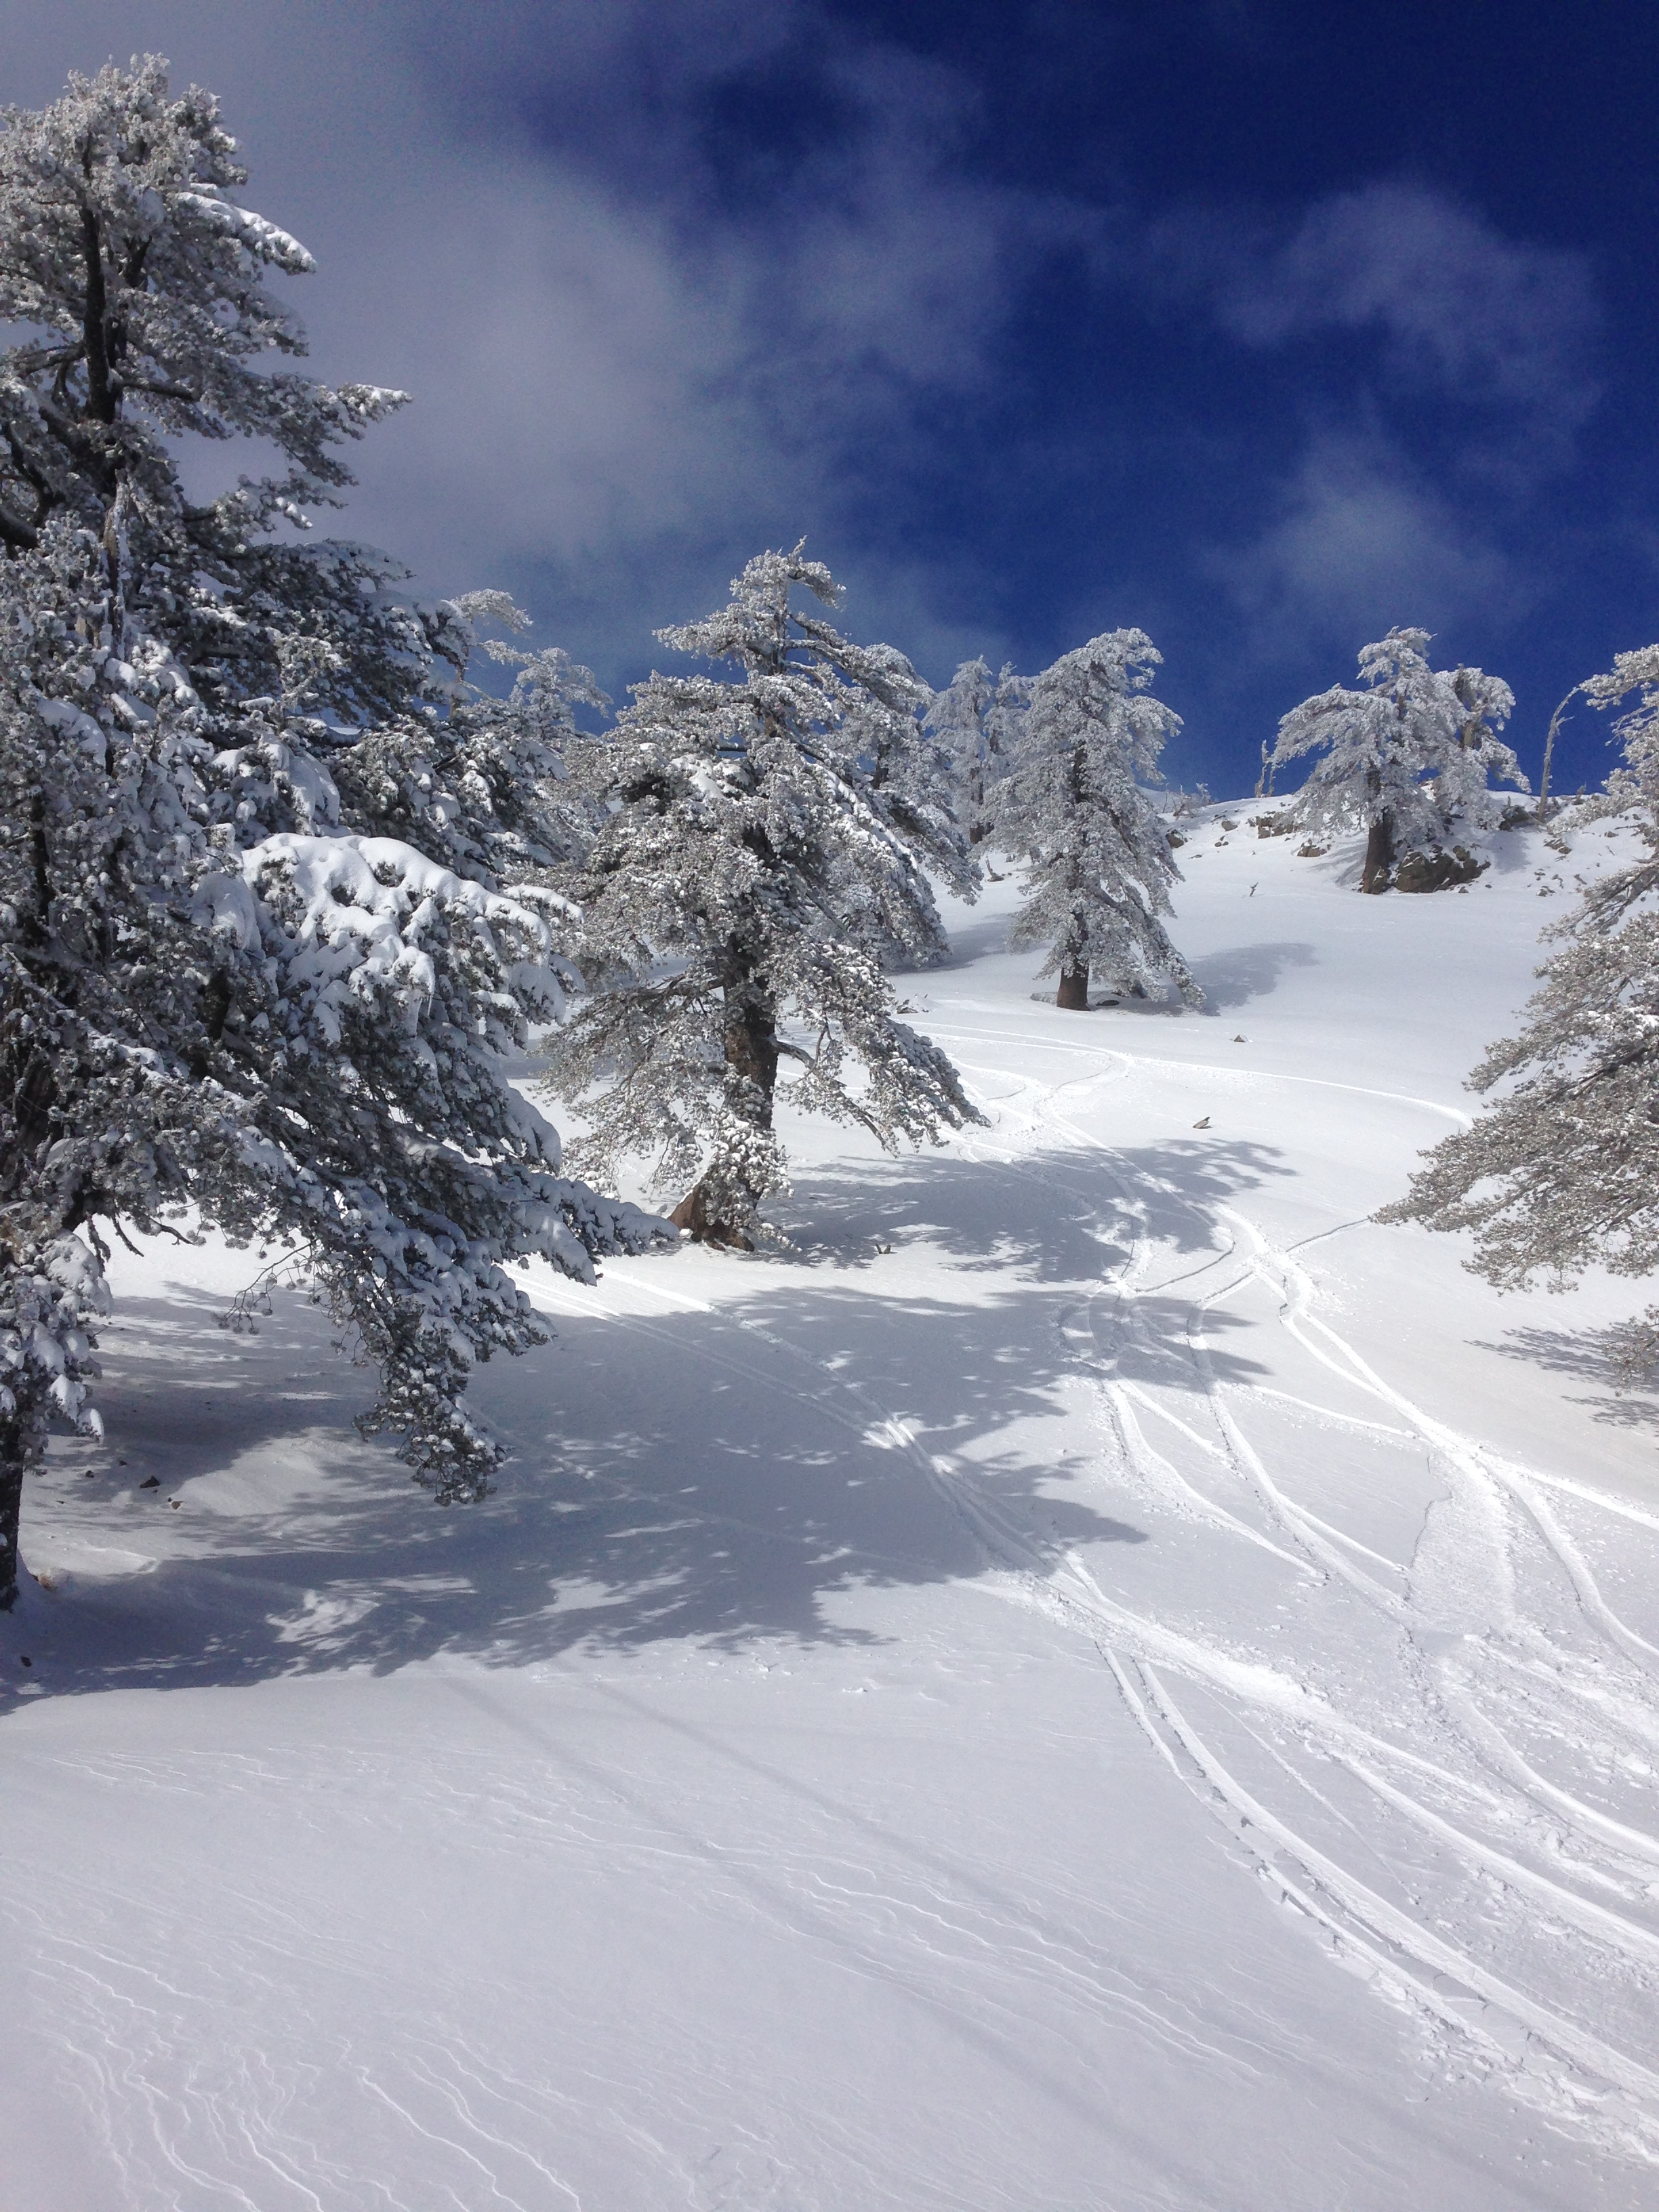 perfect day for snowboard, Vasilitsa